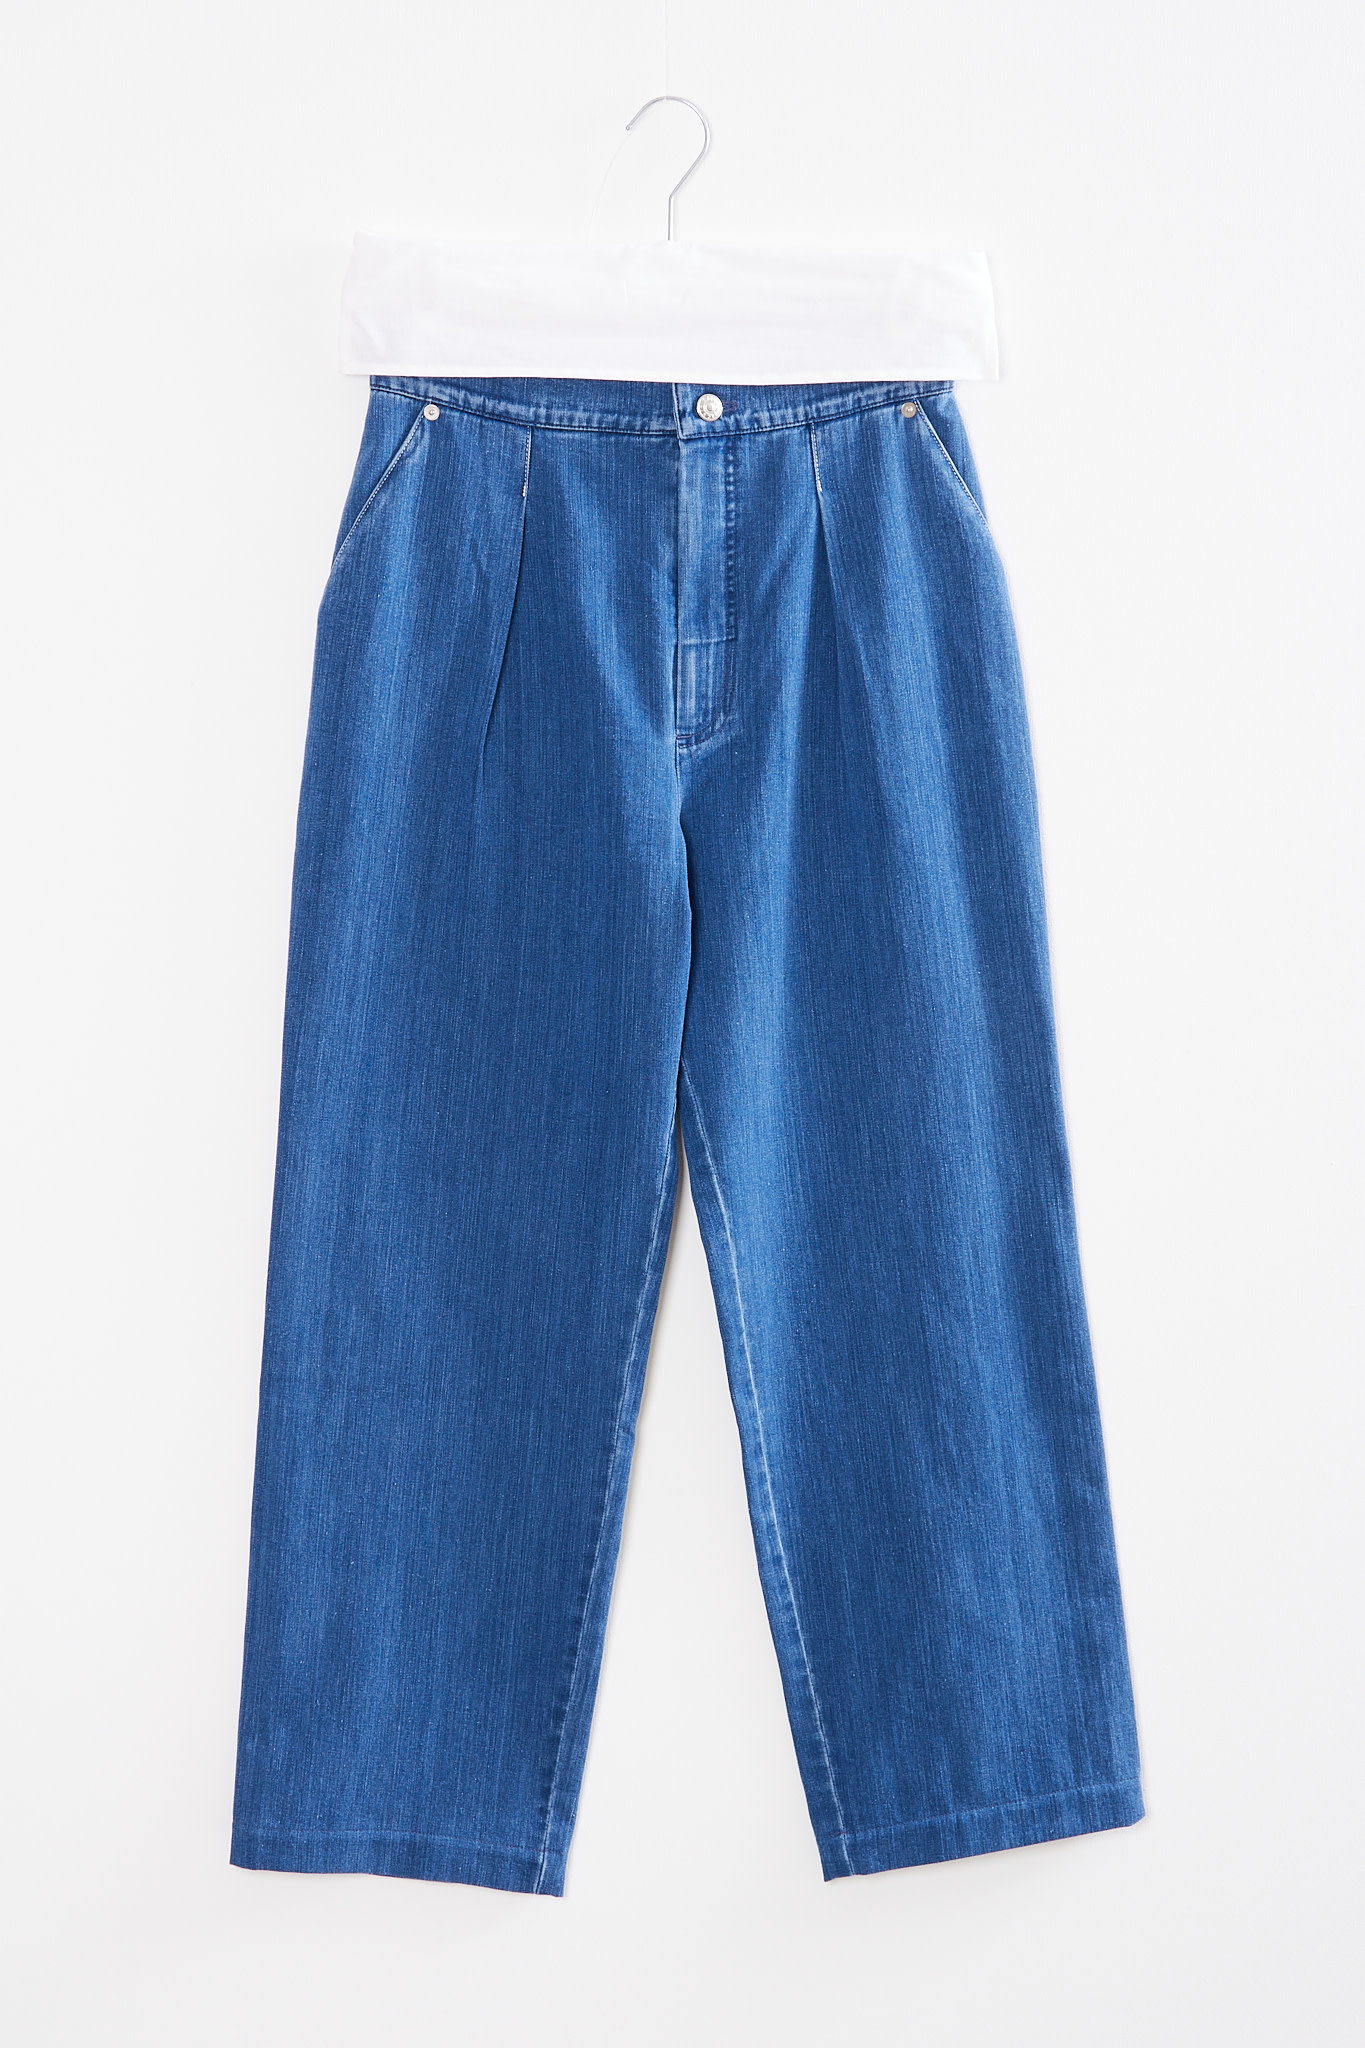 Facon Jacmīn Patti high waist pants